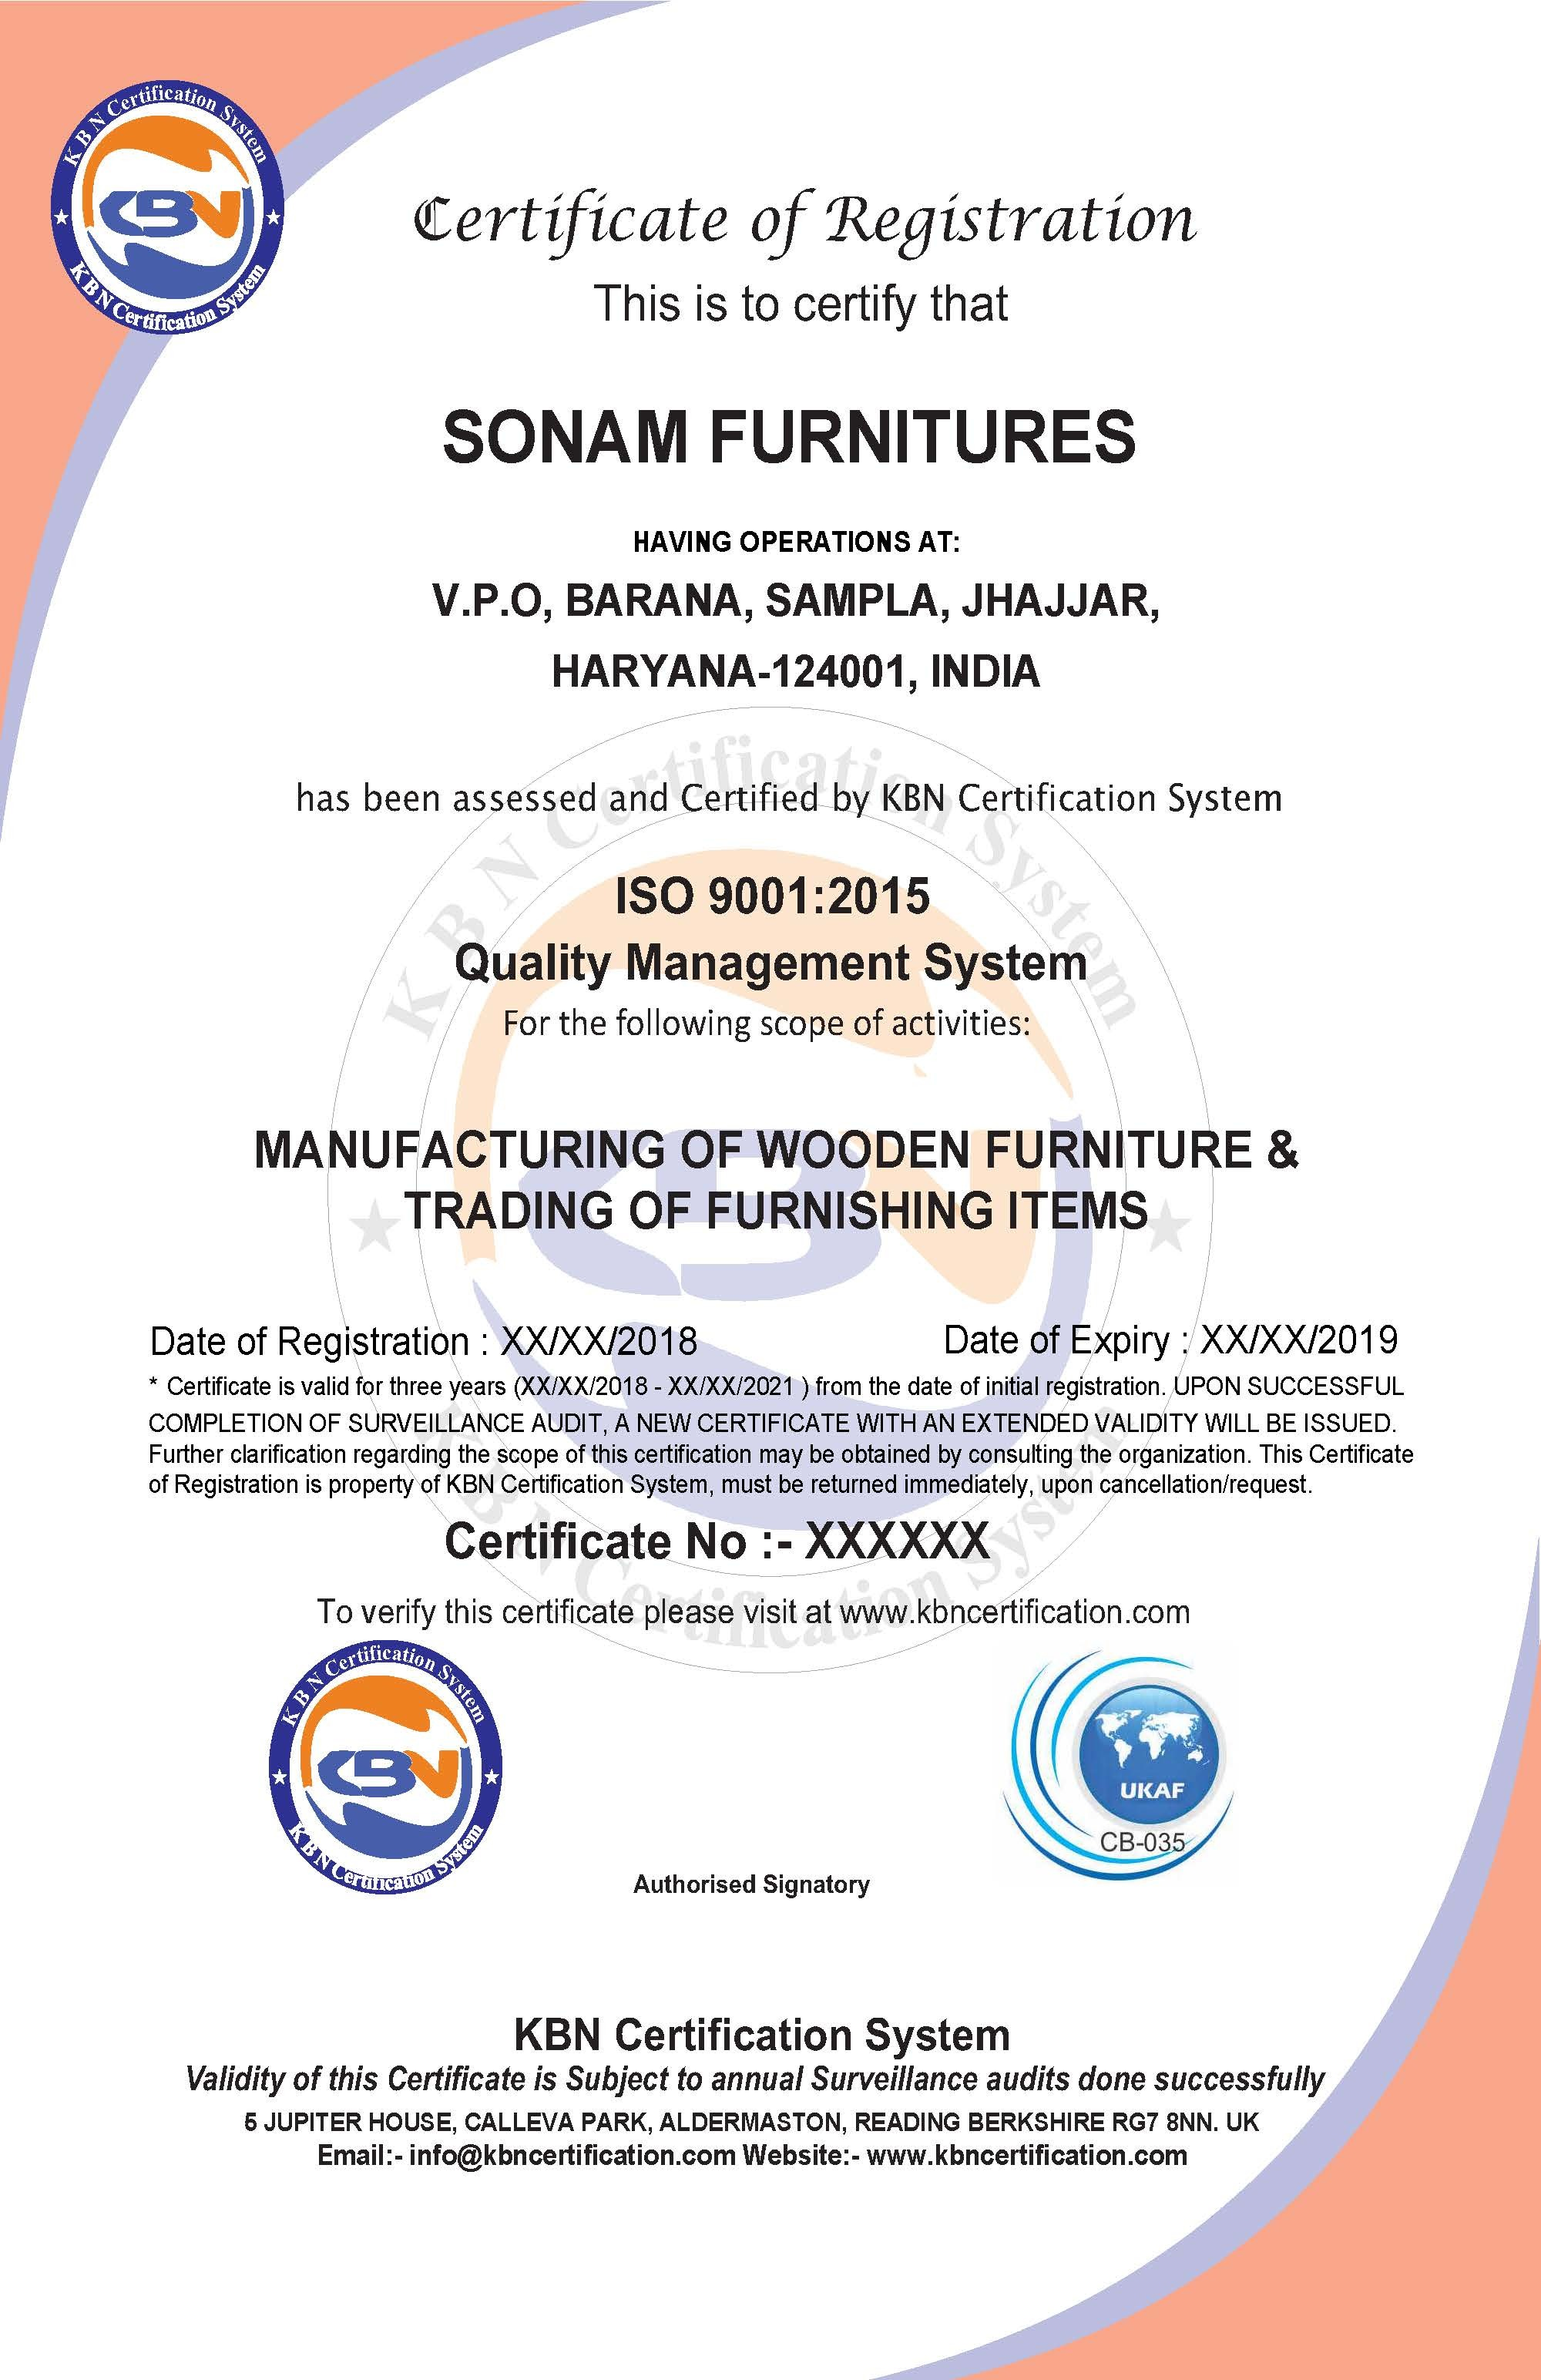 ISO 9001:2015 Certification Body